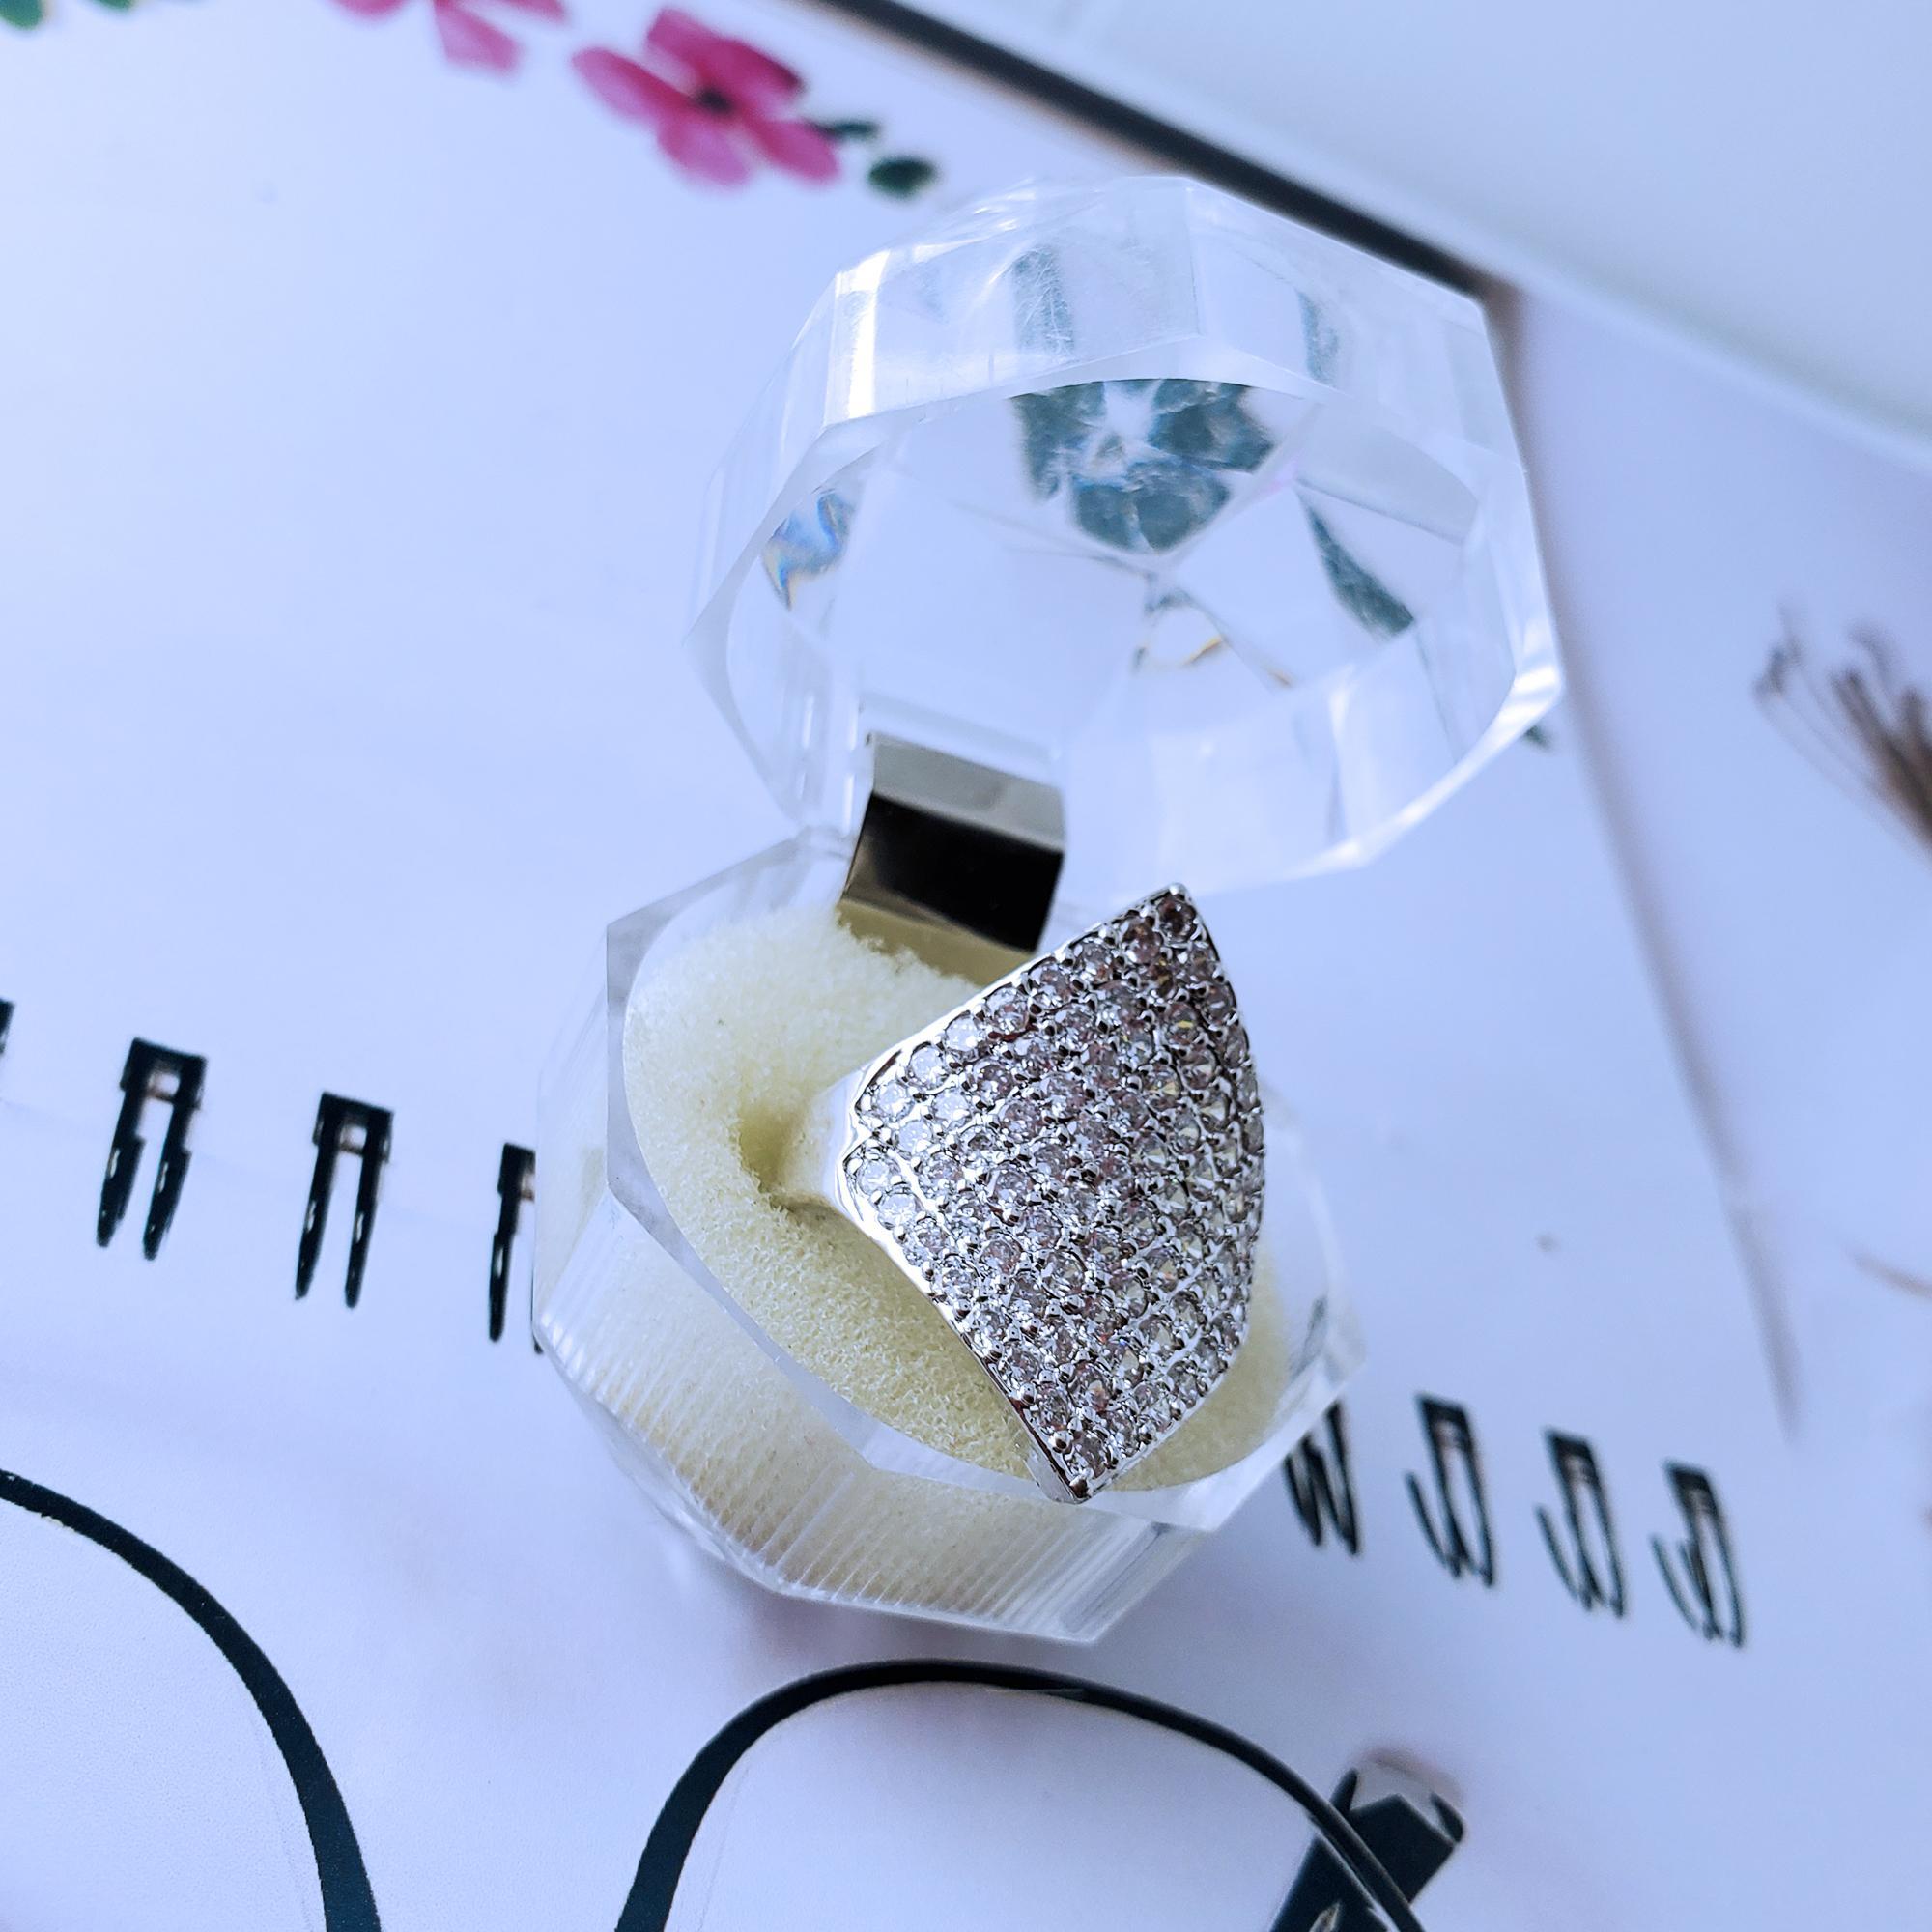 Cincin Cantik Xuping Perhiasan Wanita Permata Cantik - Silver 709